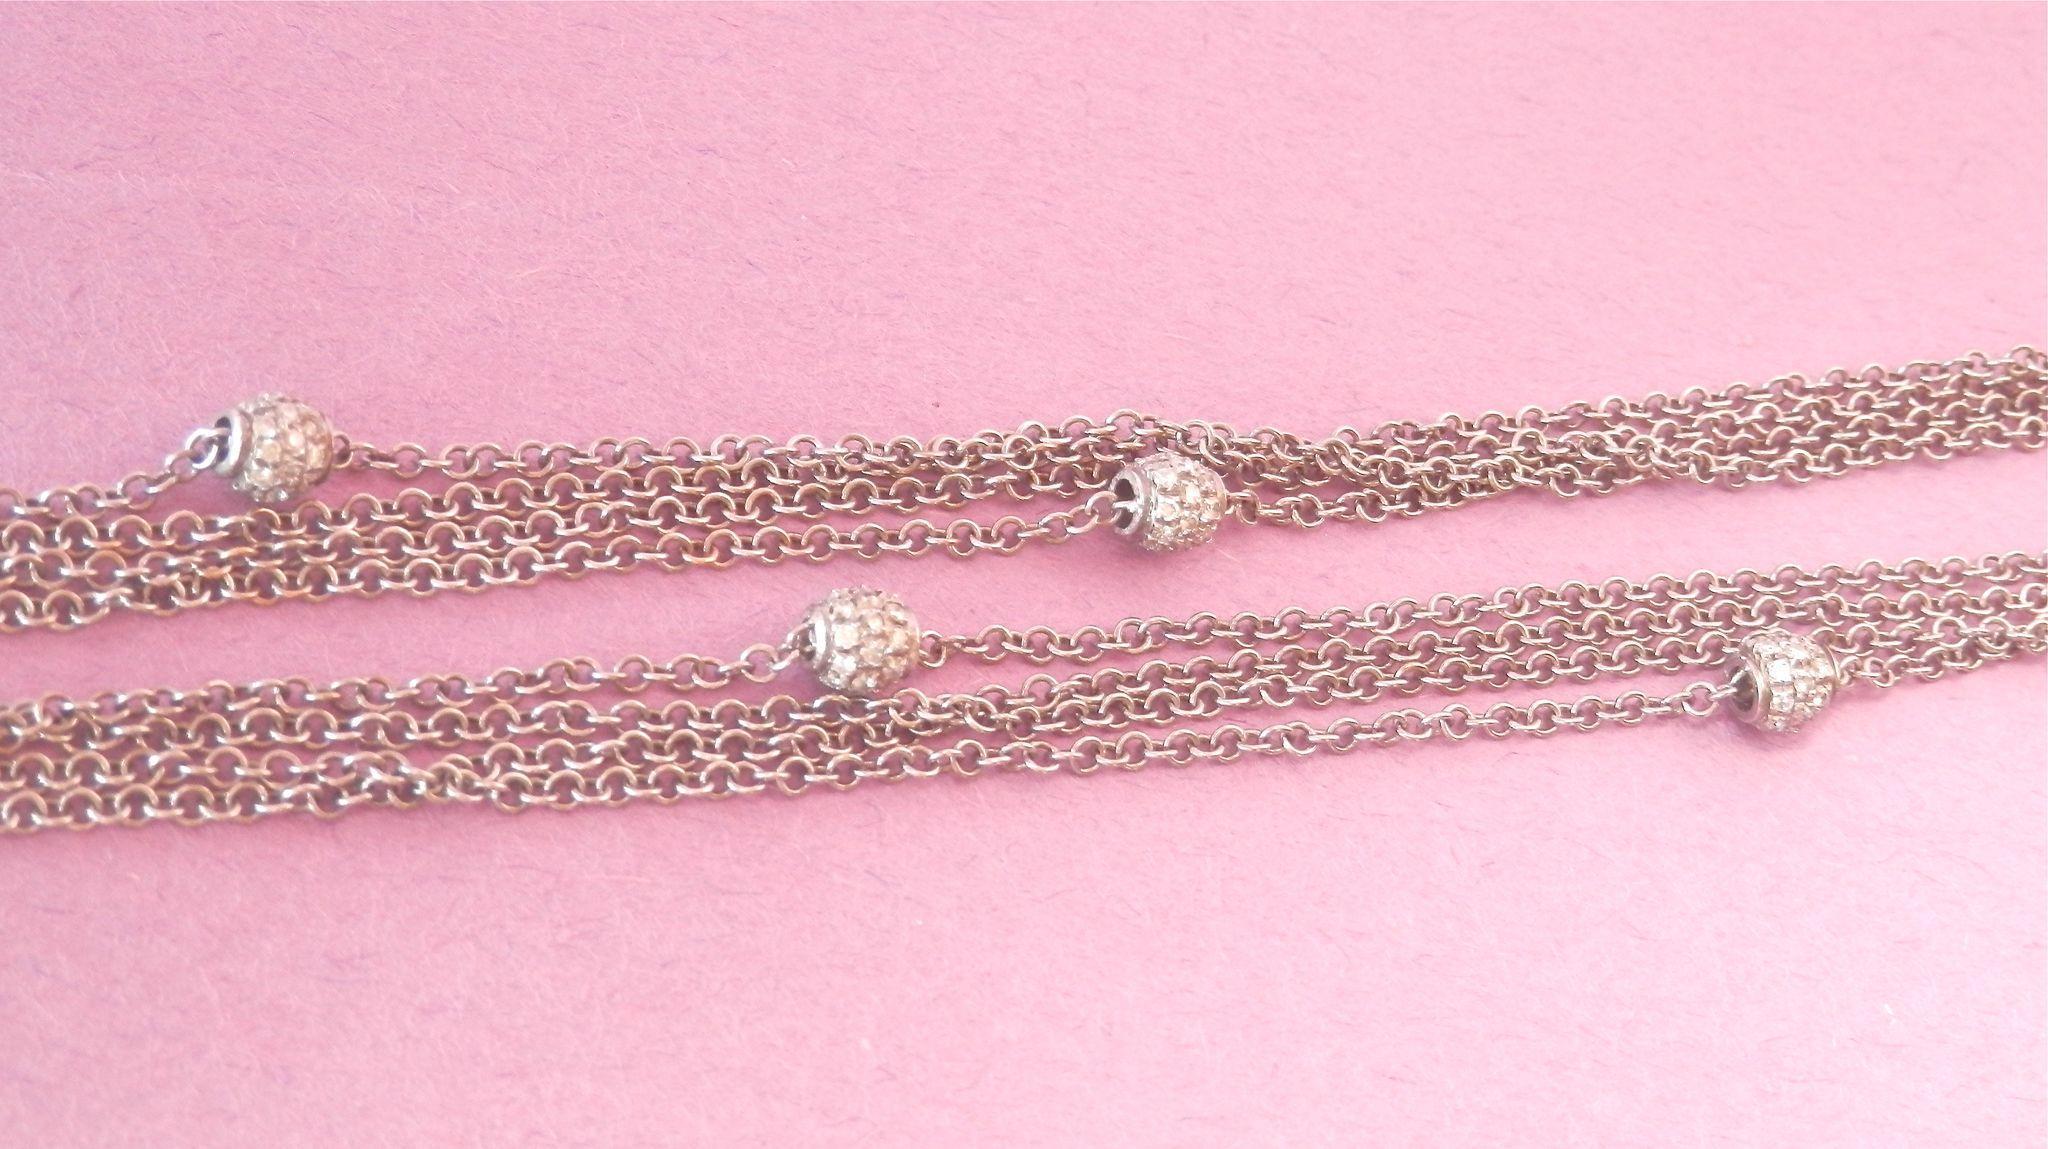 Striking LEO PIZZO 18K W/ Gold Multi-Strand 1.04 ct. Diamond Ball Necklace